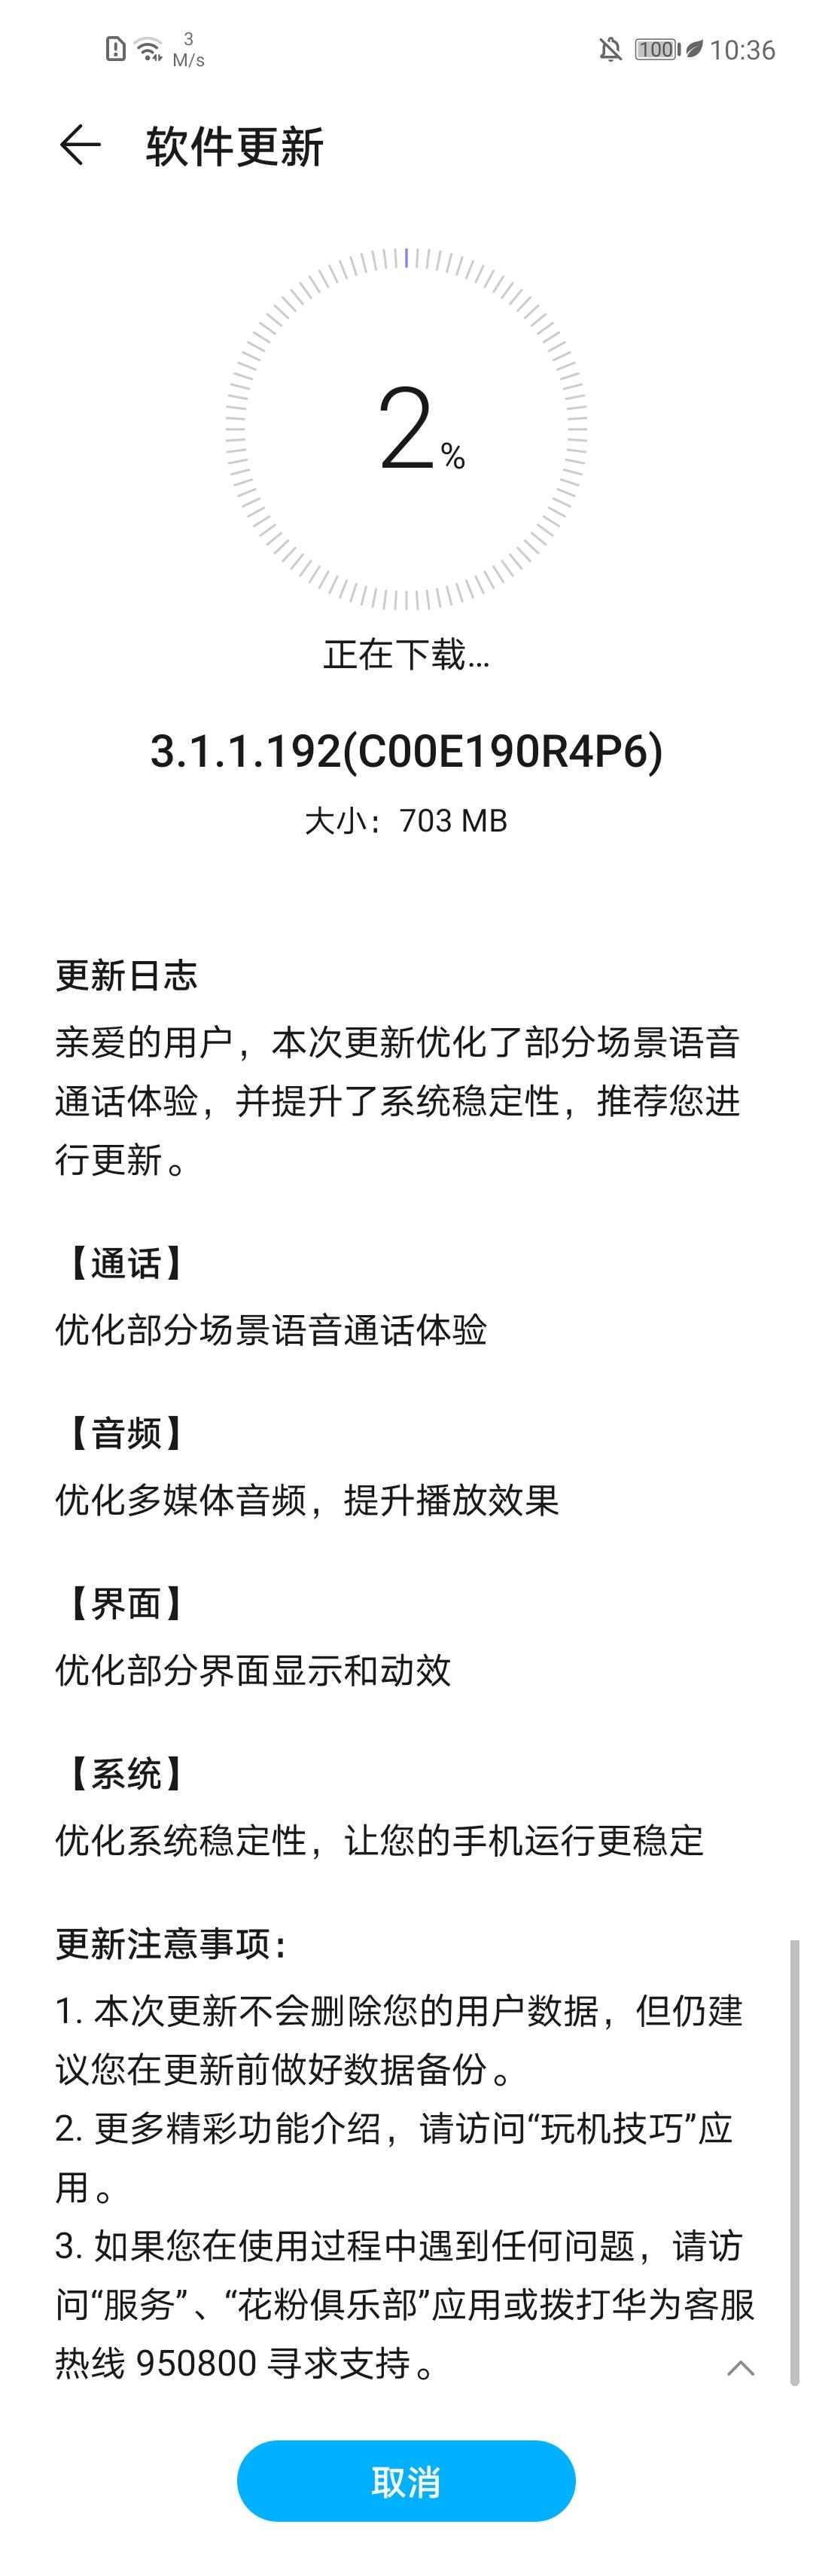 Screenshot_20200824_103640_com.huawei.android.hwouc.jpg